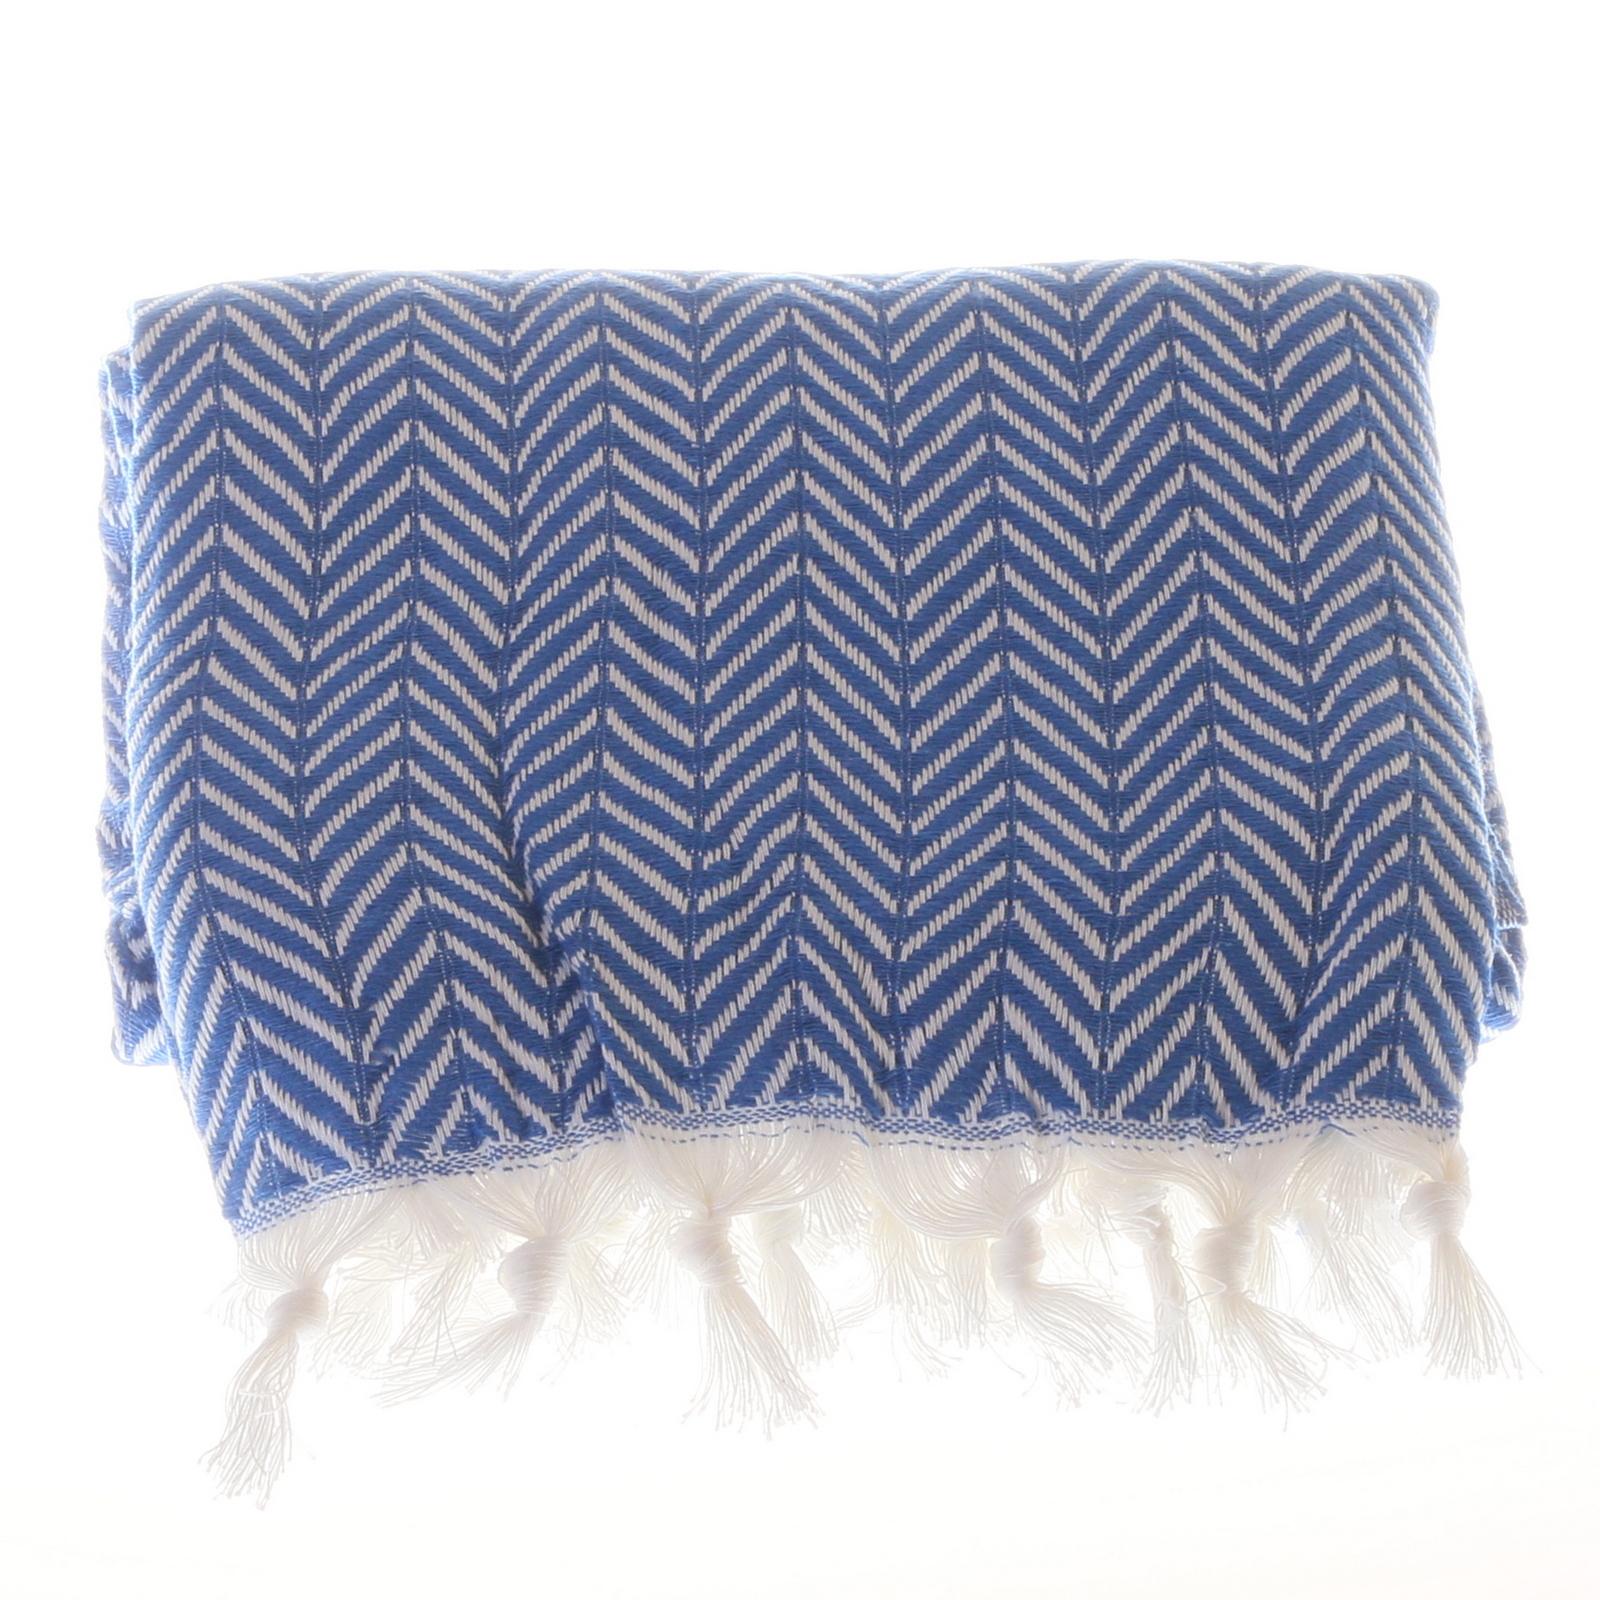 Big zigzag pattern cotton hammam towel - Blue